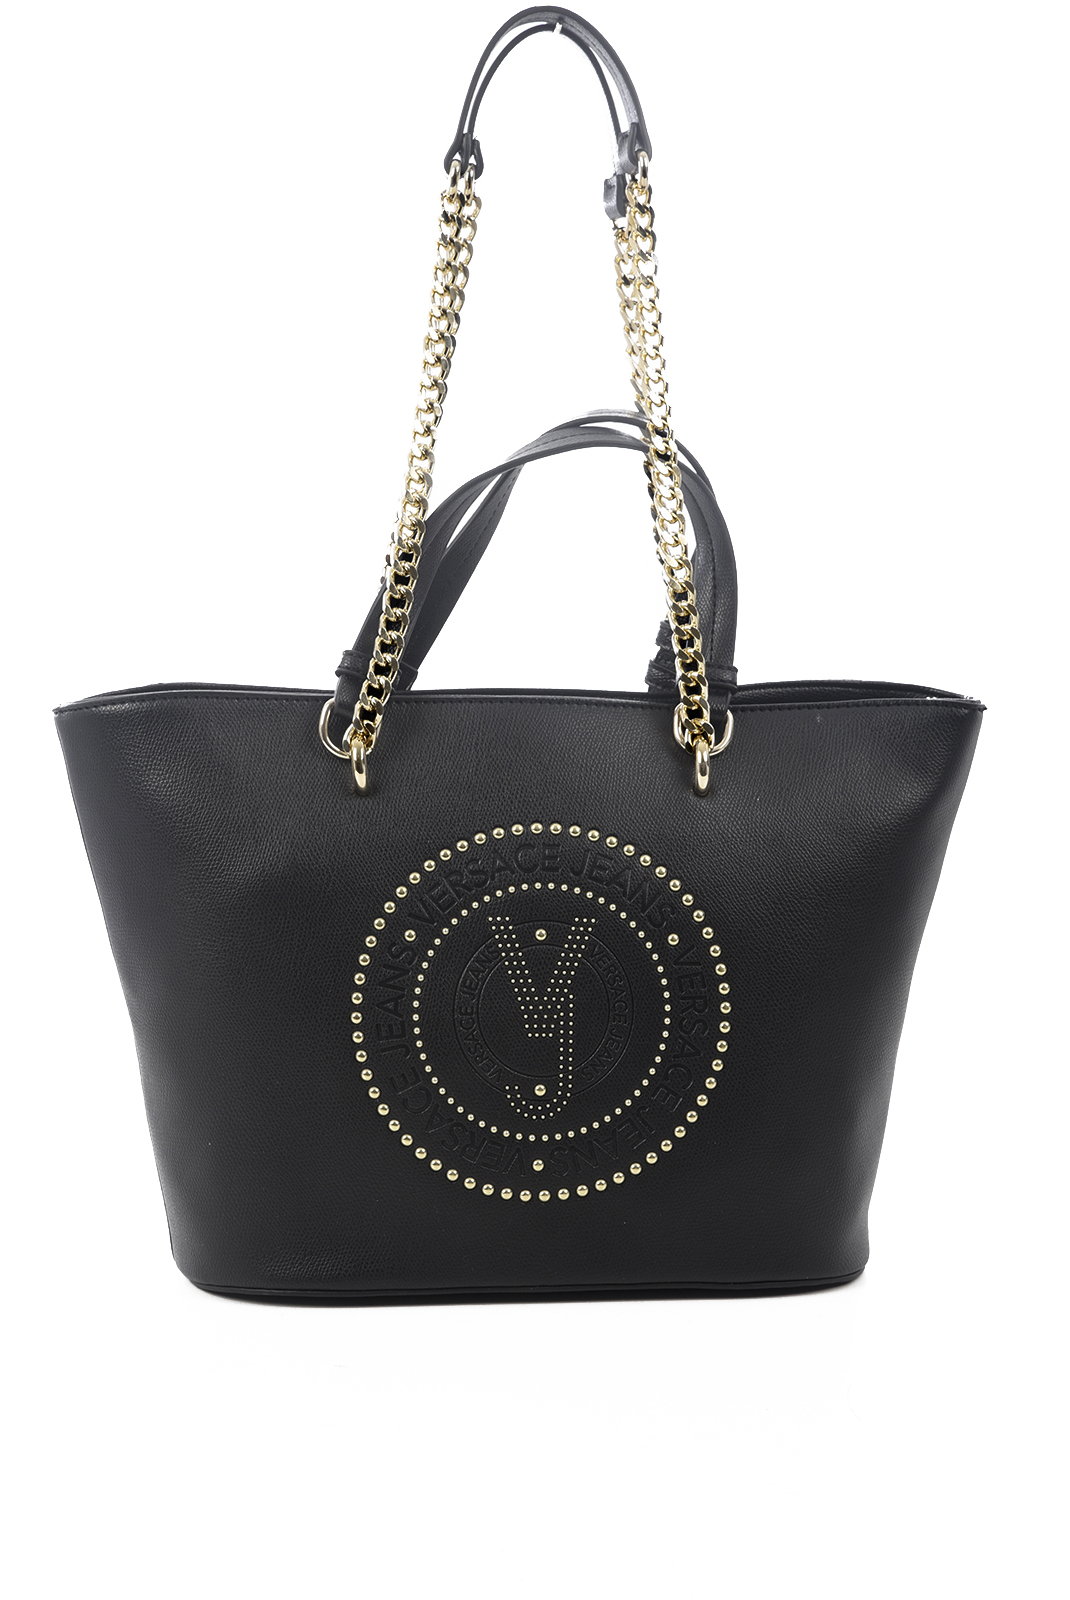 Cabas / Sacs shopping  Versace Jeans VRBBQ7 899 NOIR